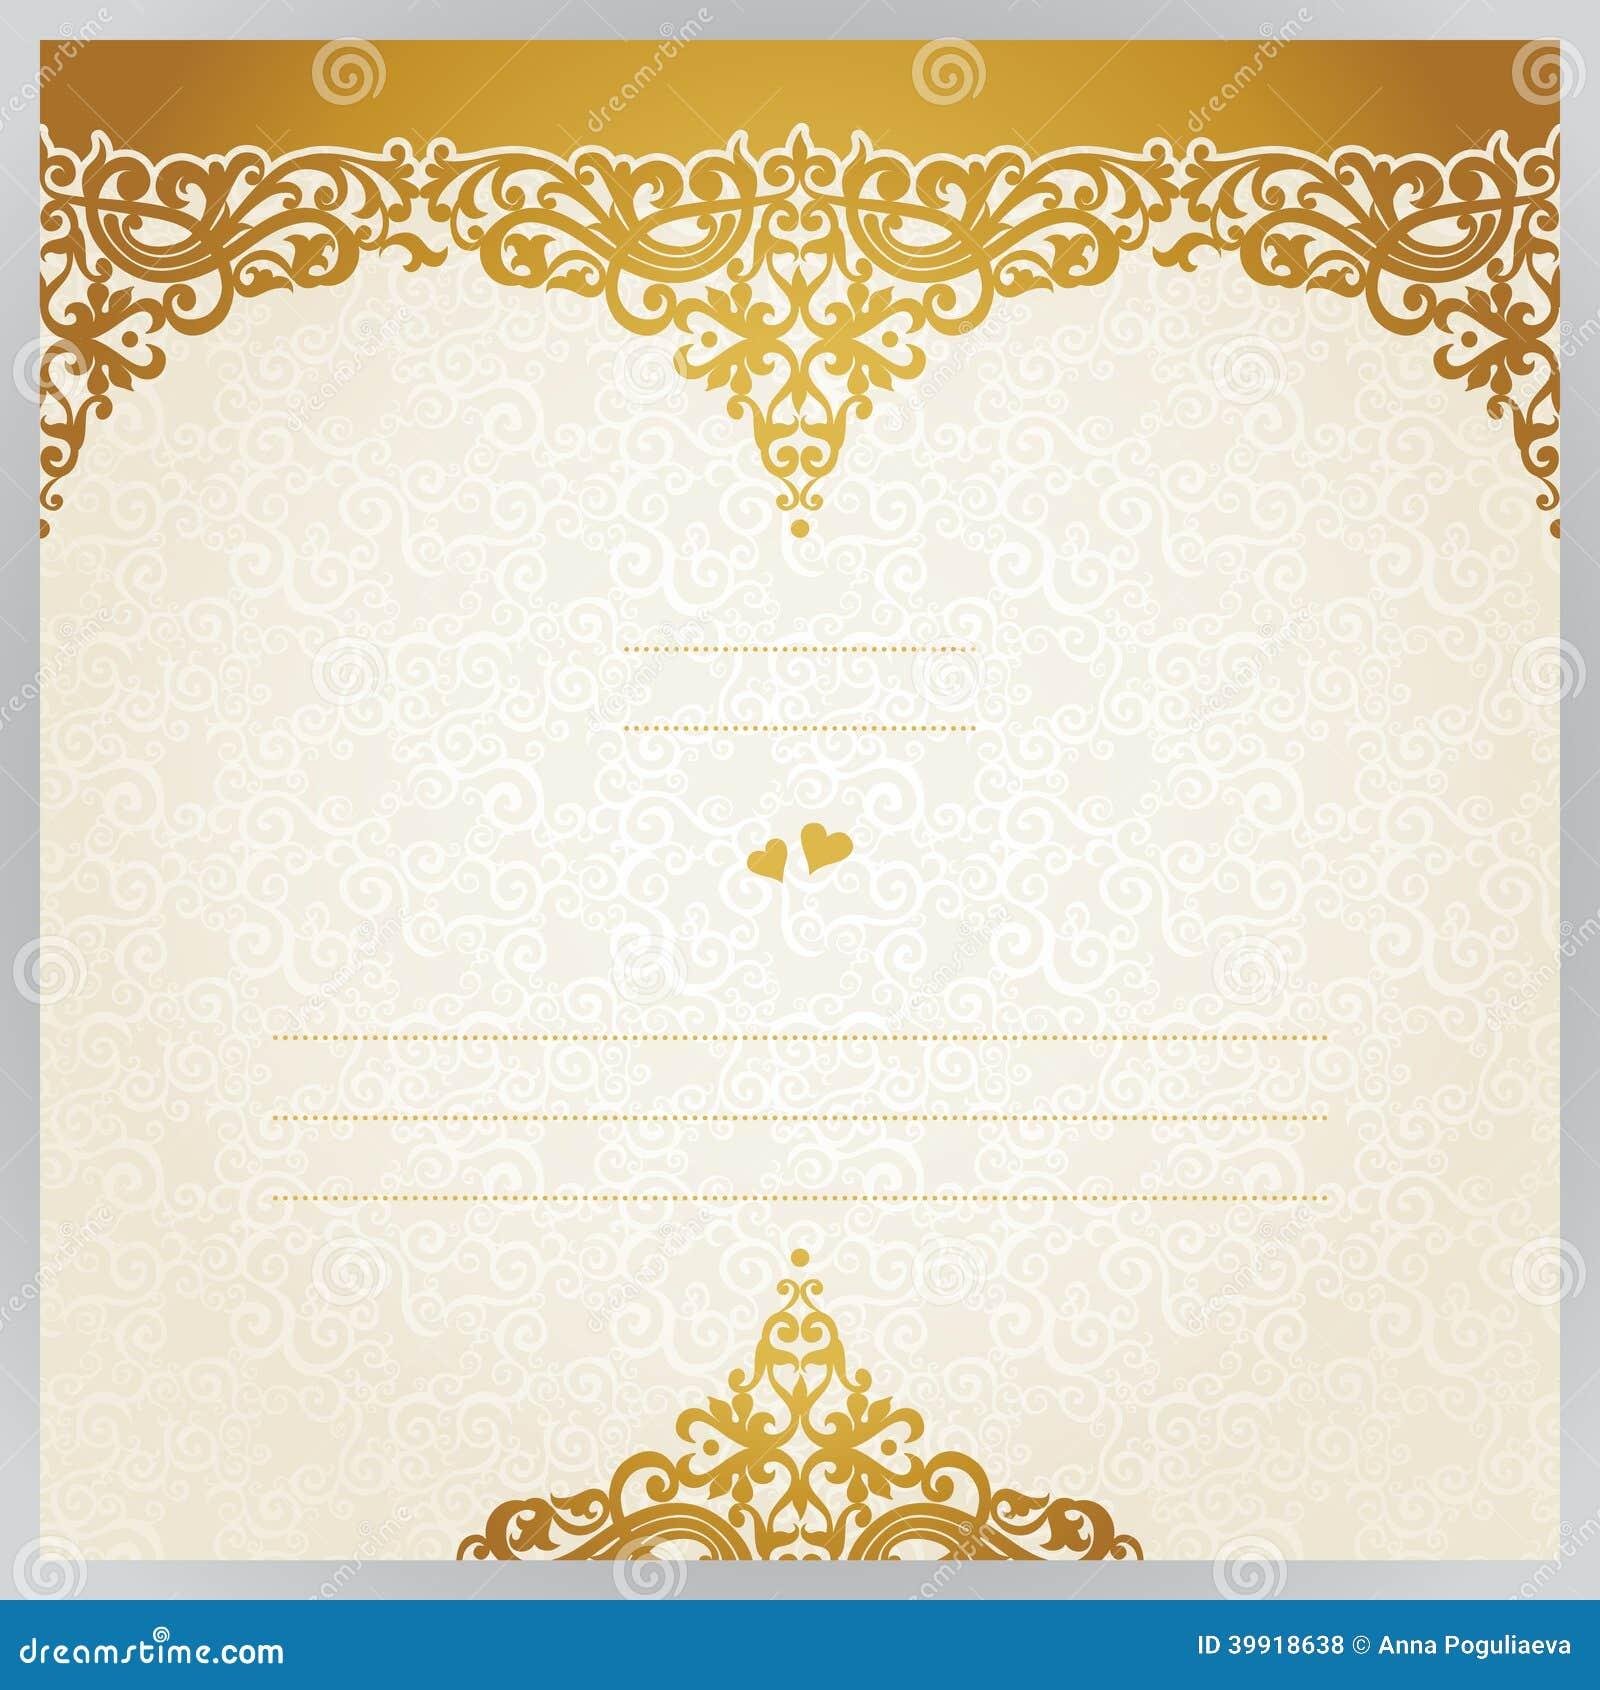 Oriental Wedding Invitations was perfect invitation template